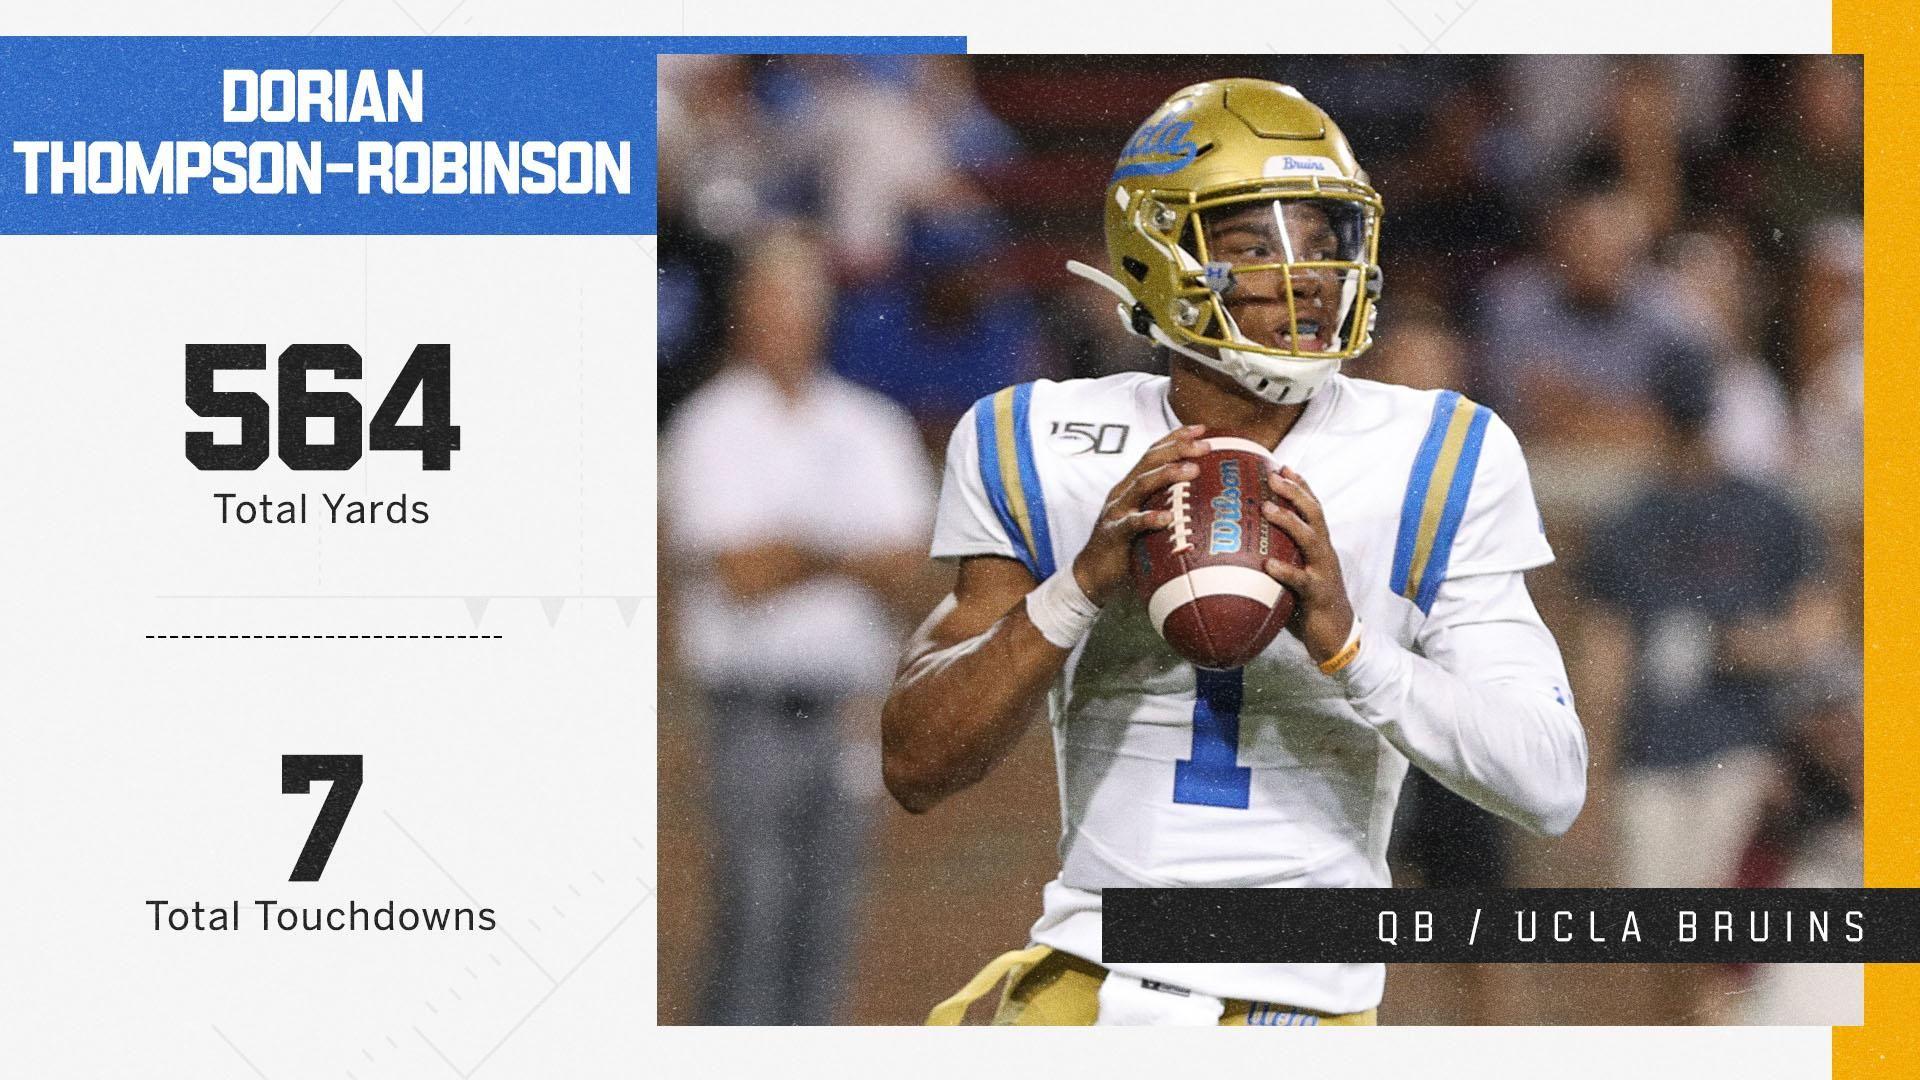 ESPN College Football on Espn college football, Espn